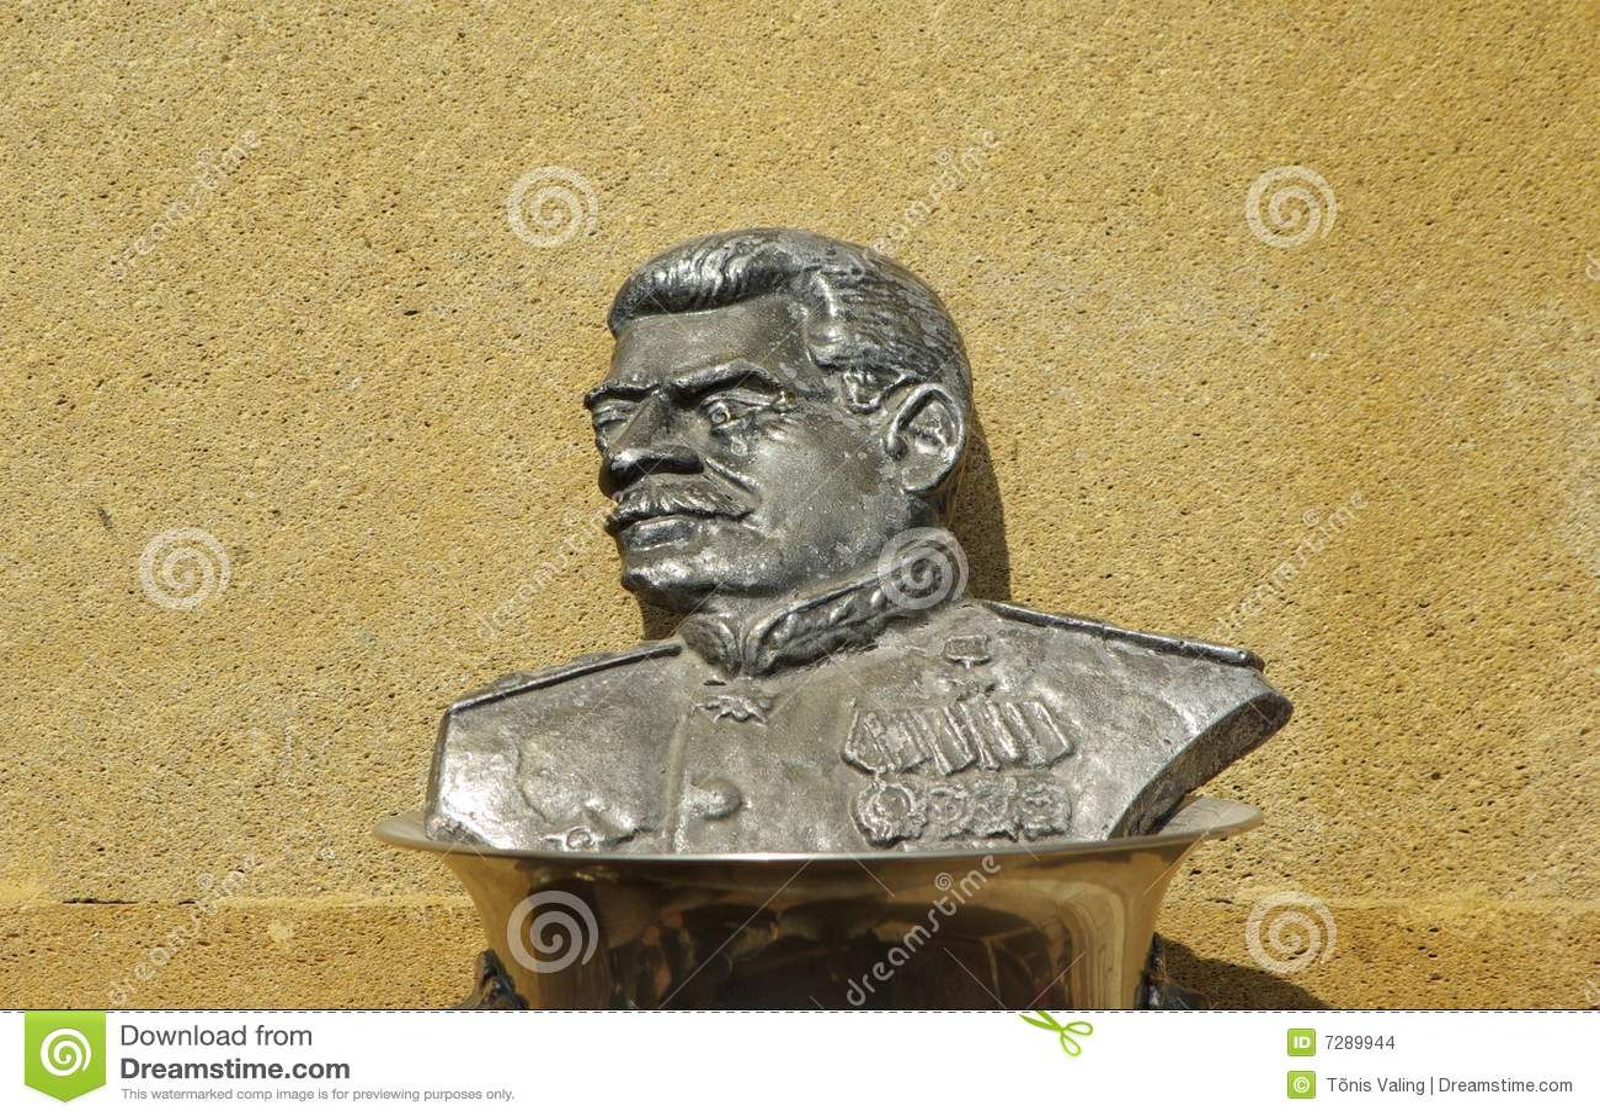 Sculture de Stalin